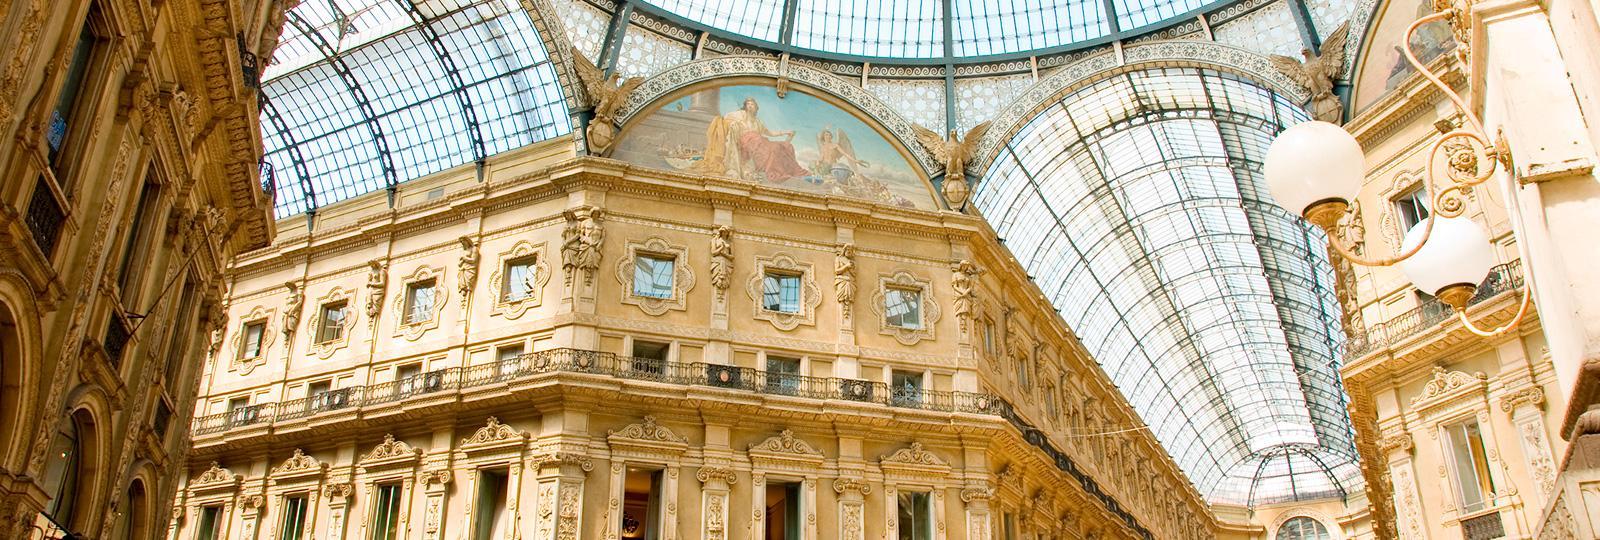 Landscape Milano - Galleria